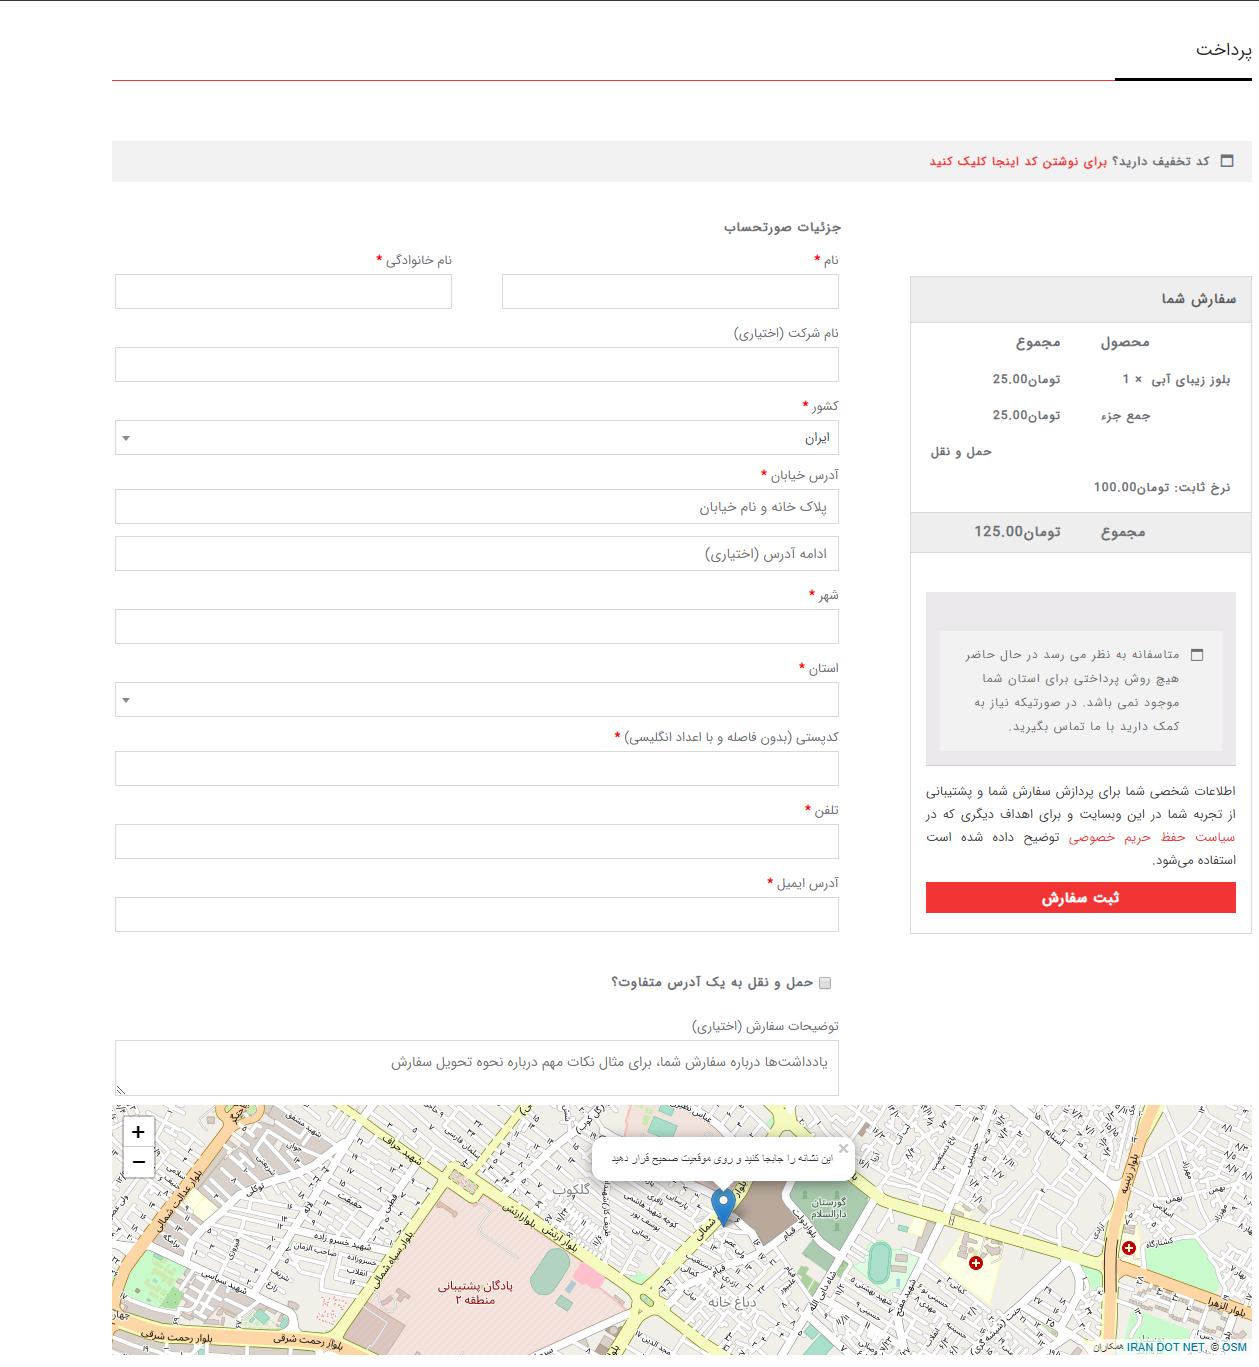 1666 8fe540514a5541fd1946038e4 - افزونه نقشه ایران برای وردپرس و ووکامرس